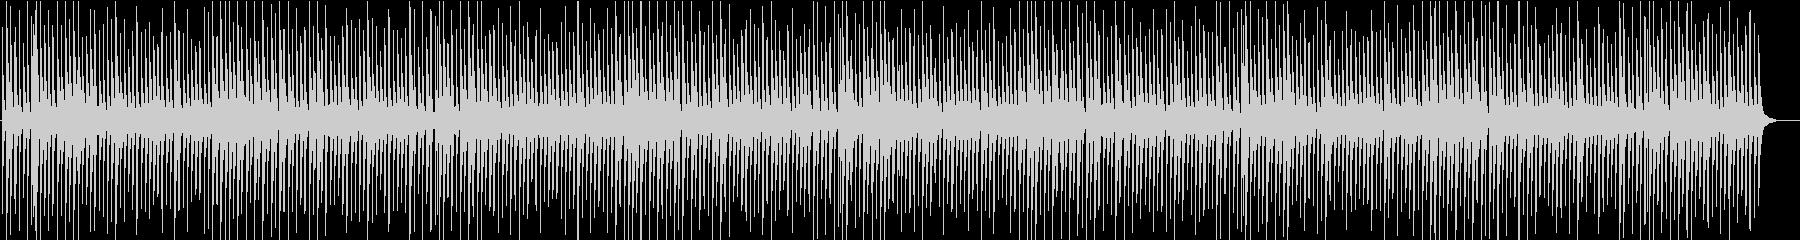 "Okinawa folk song ""Asatoya Yunta"" Sanshin only's unreproduced waveform"